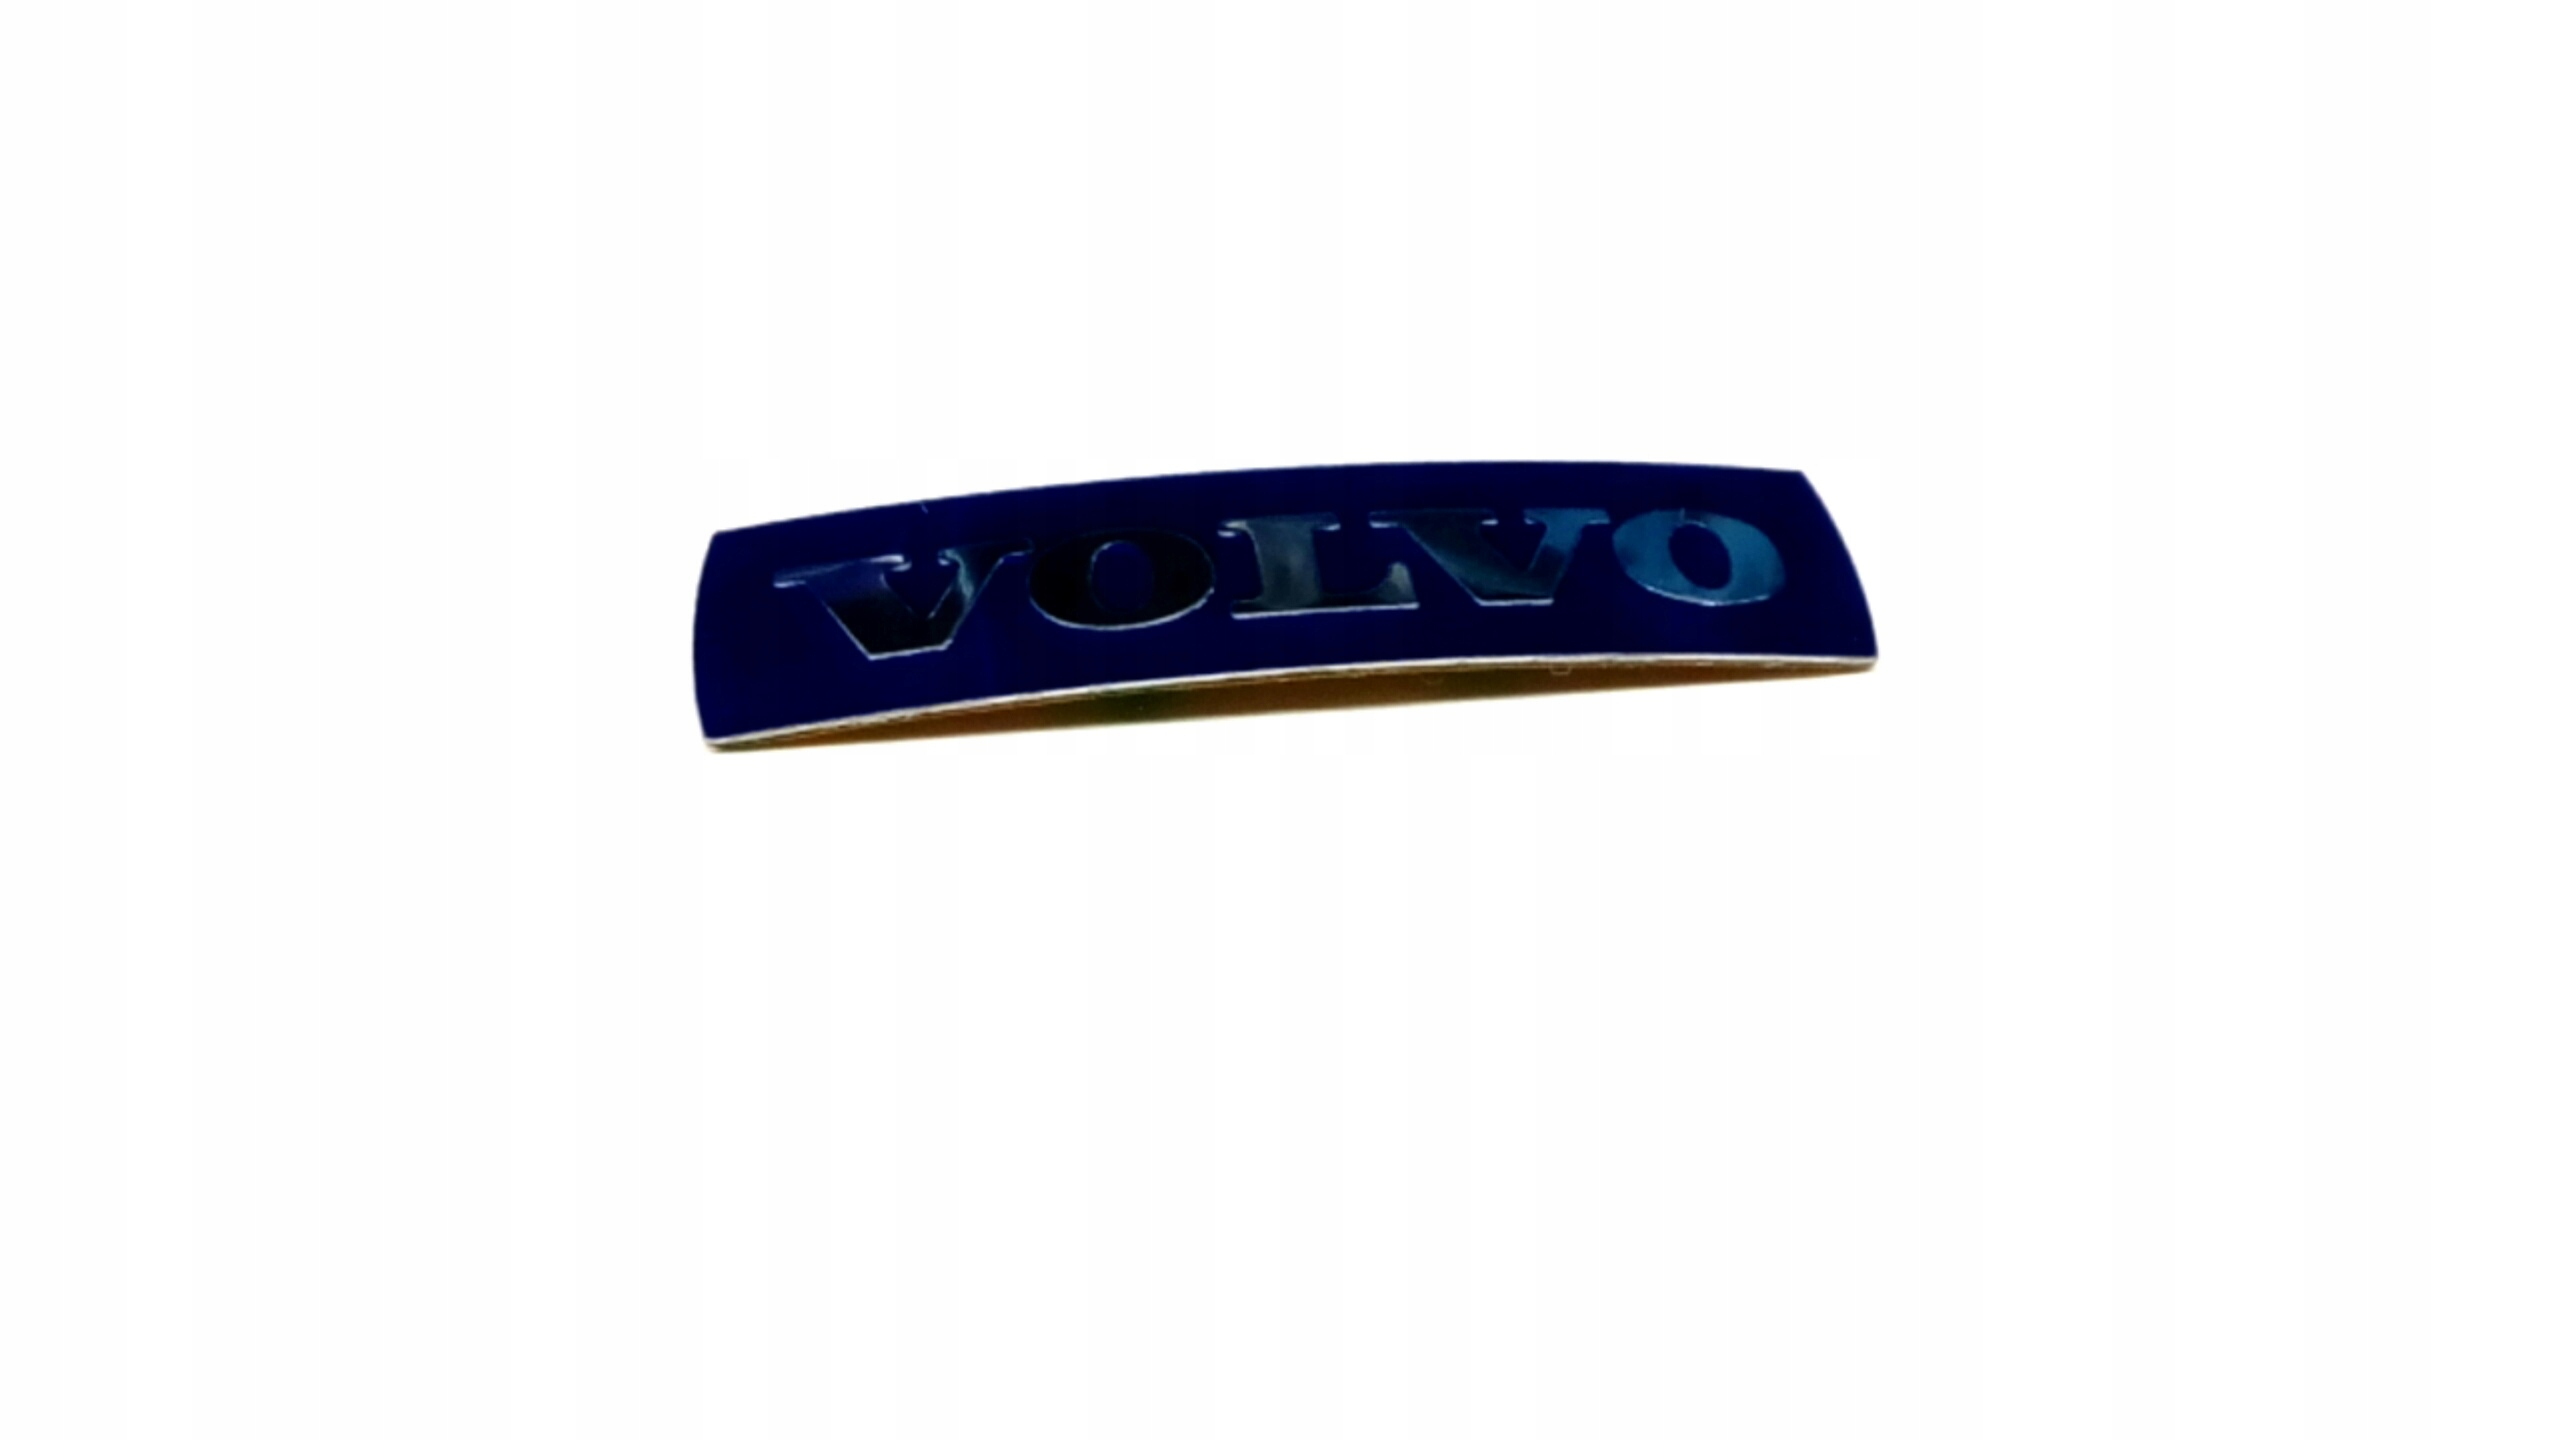 VOLVO эмблема, логотип, значок рулевого управления 31467395 OE